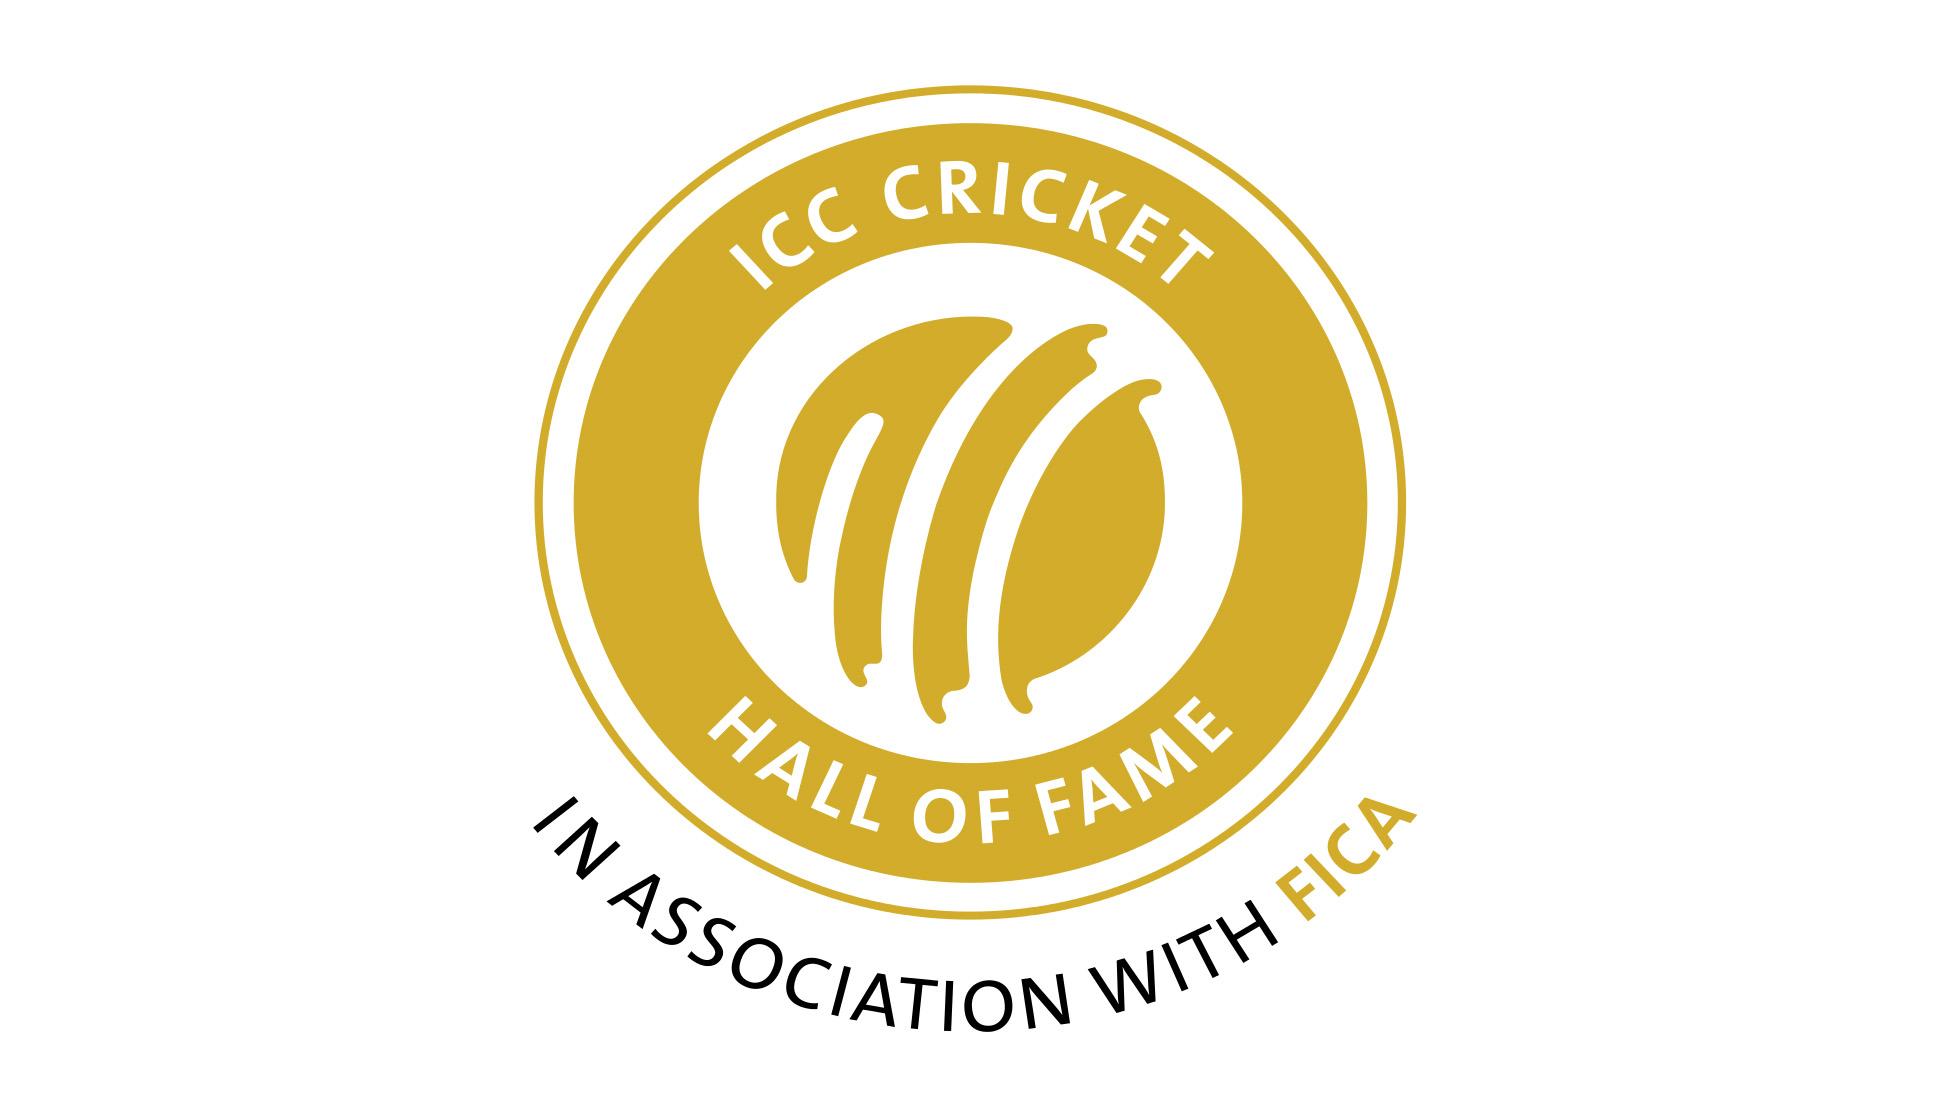 ICC-Hall-of-Fame